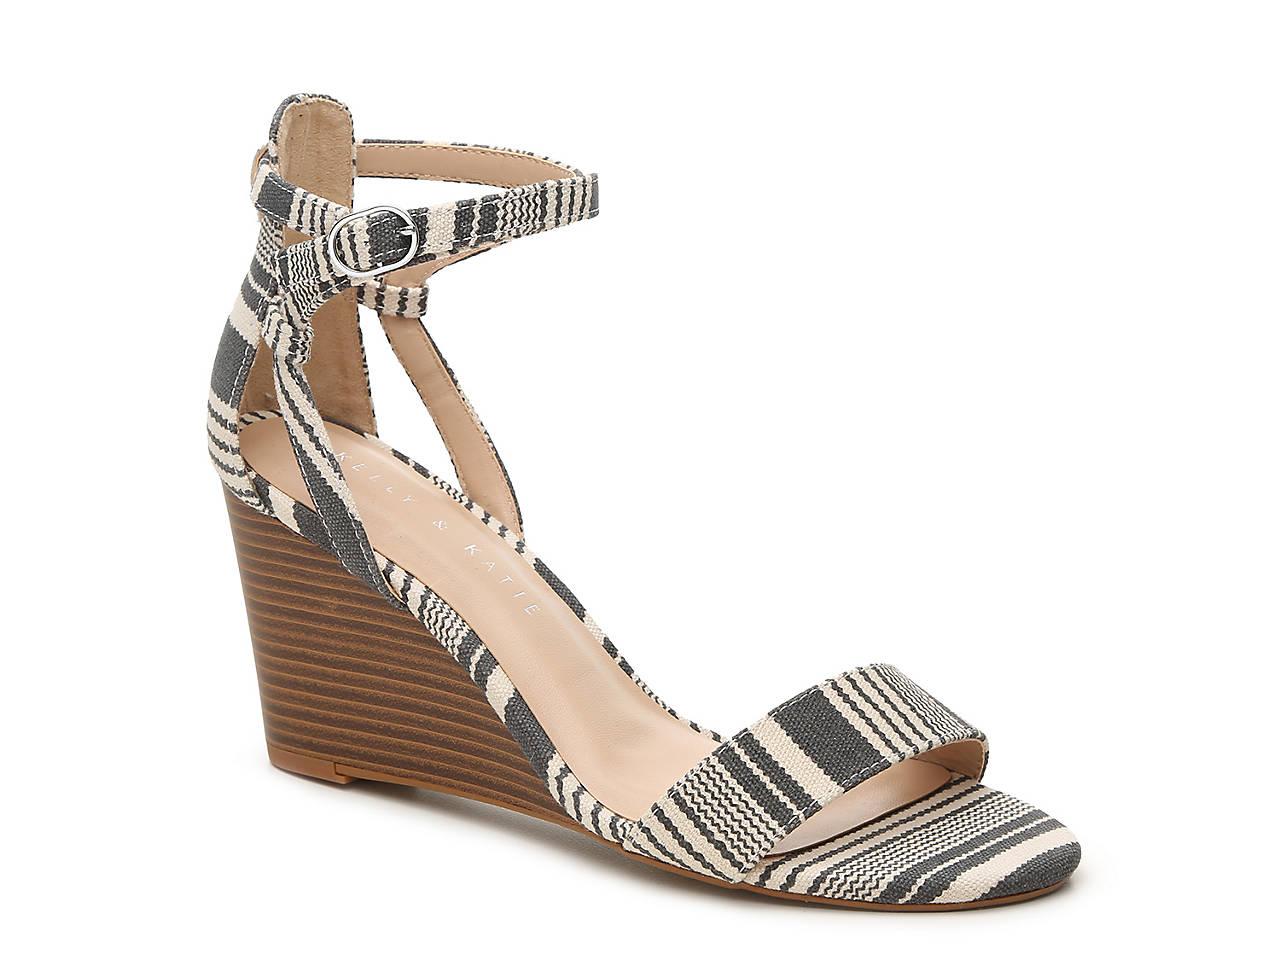 Black sandals at dsw - Tamra Wedge Sandal